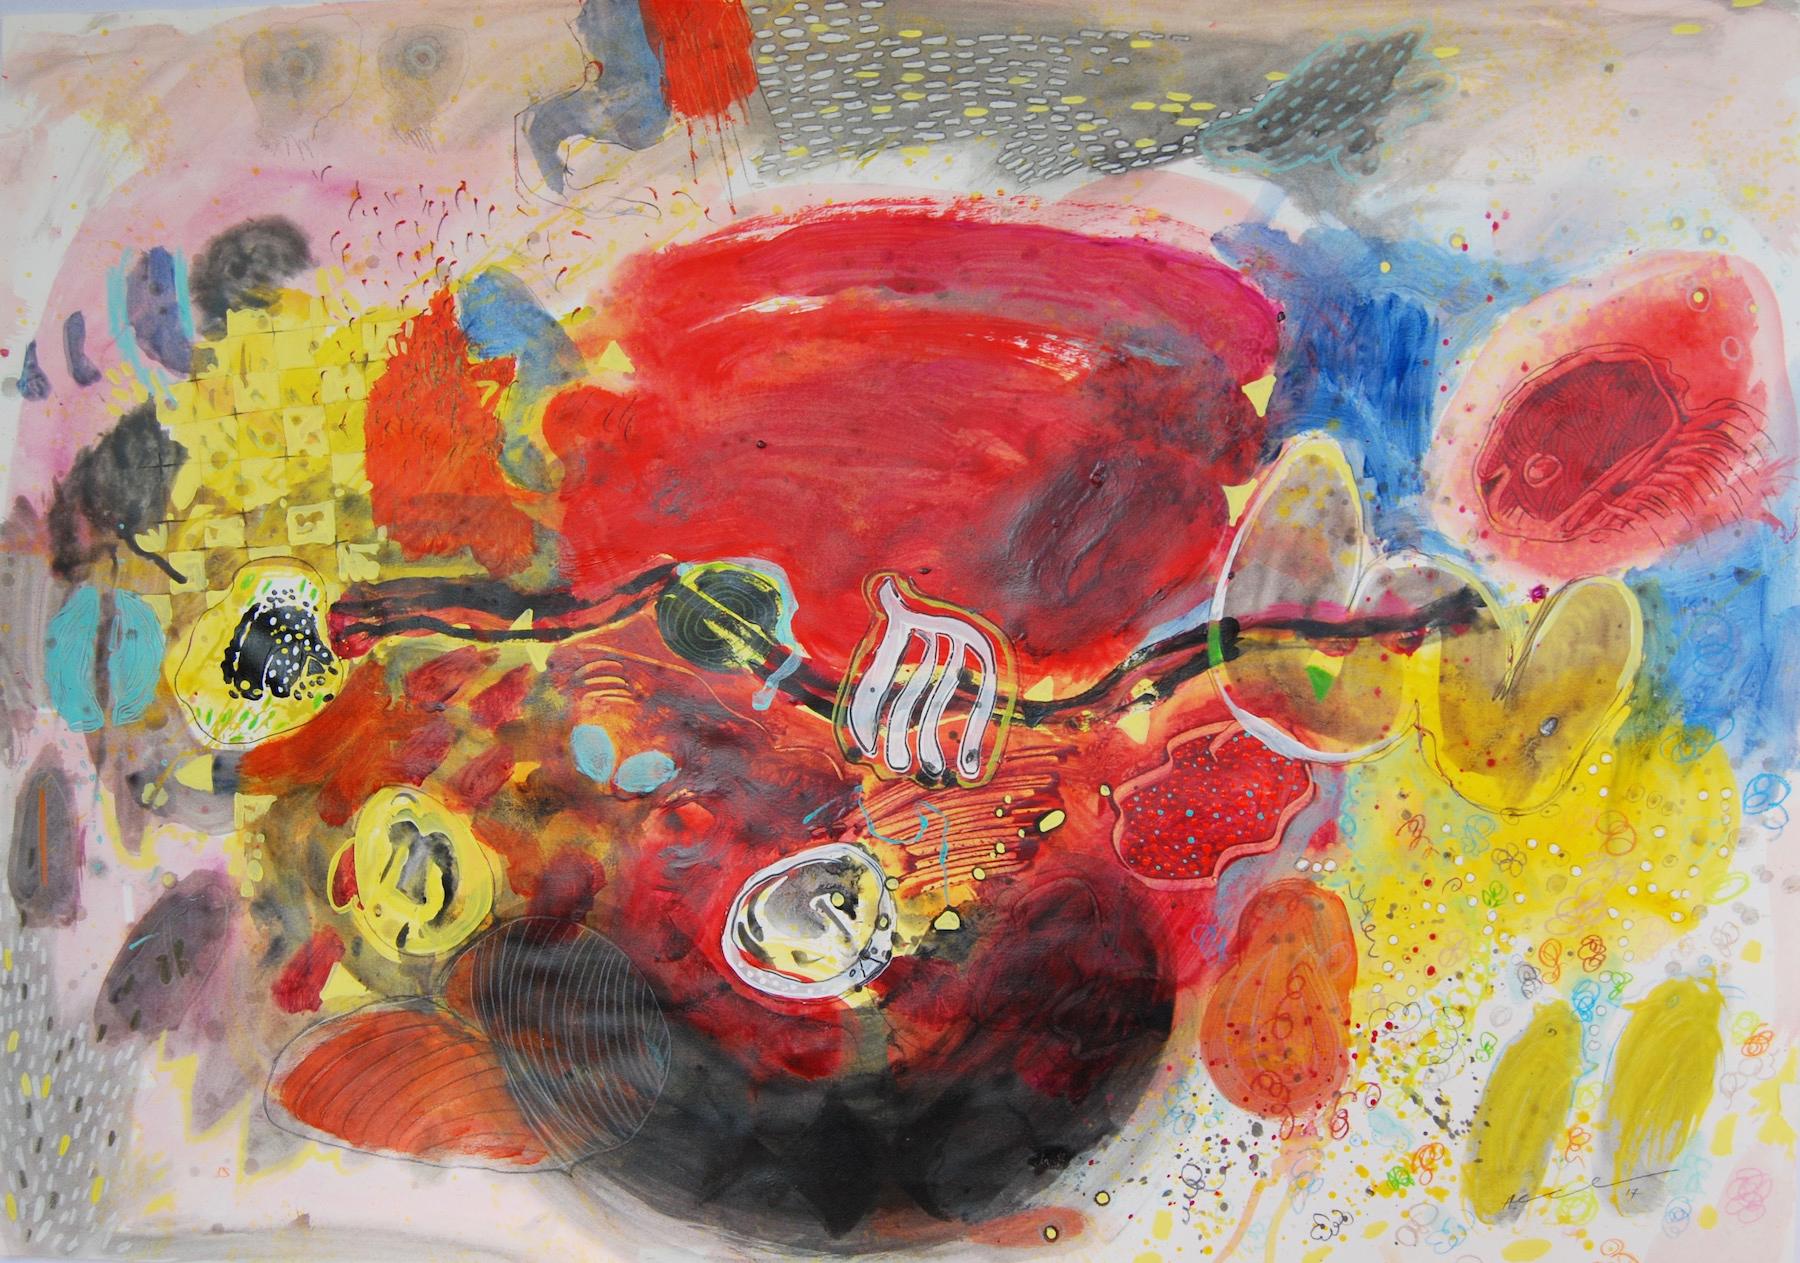 Hussein Salim - Untitled, 70 x 100cm